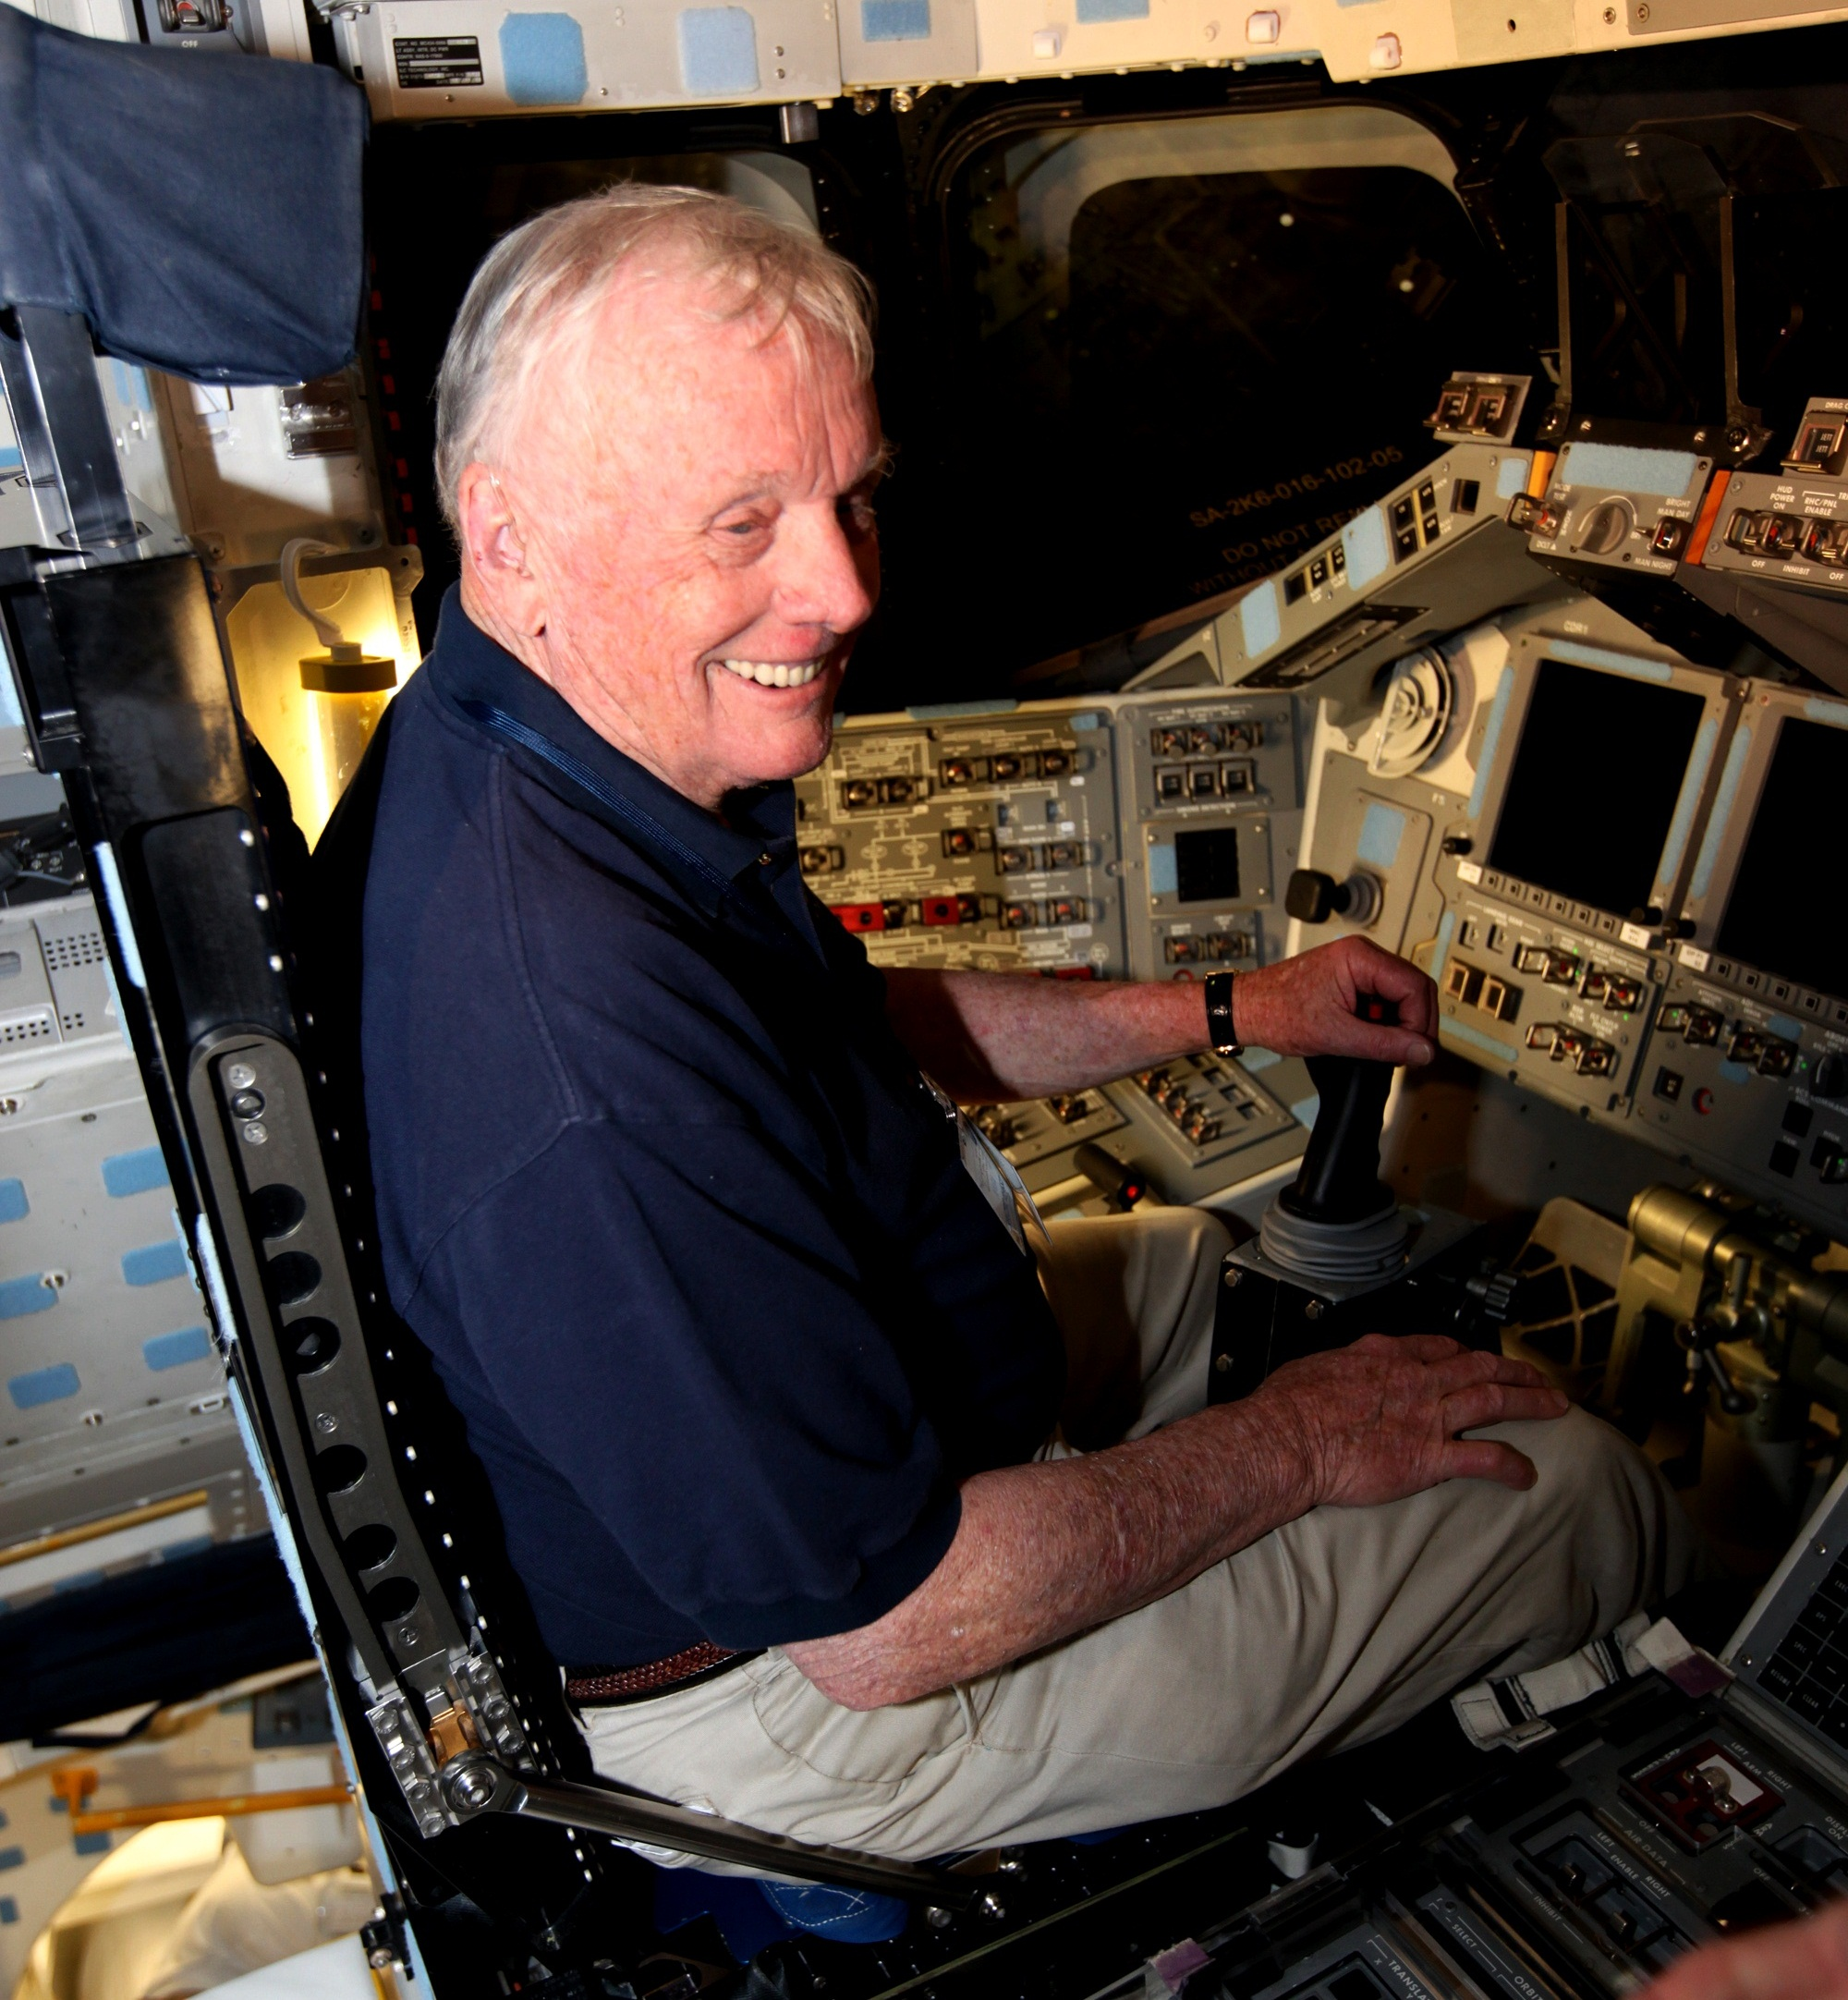 apollo and space shuttle astronauts - photo #41